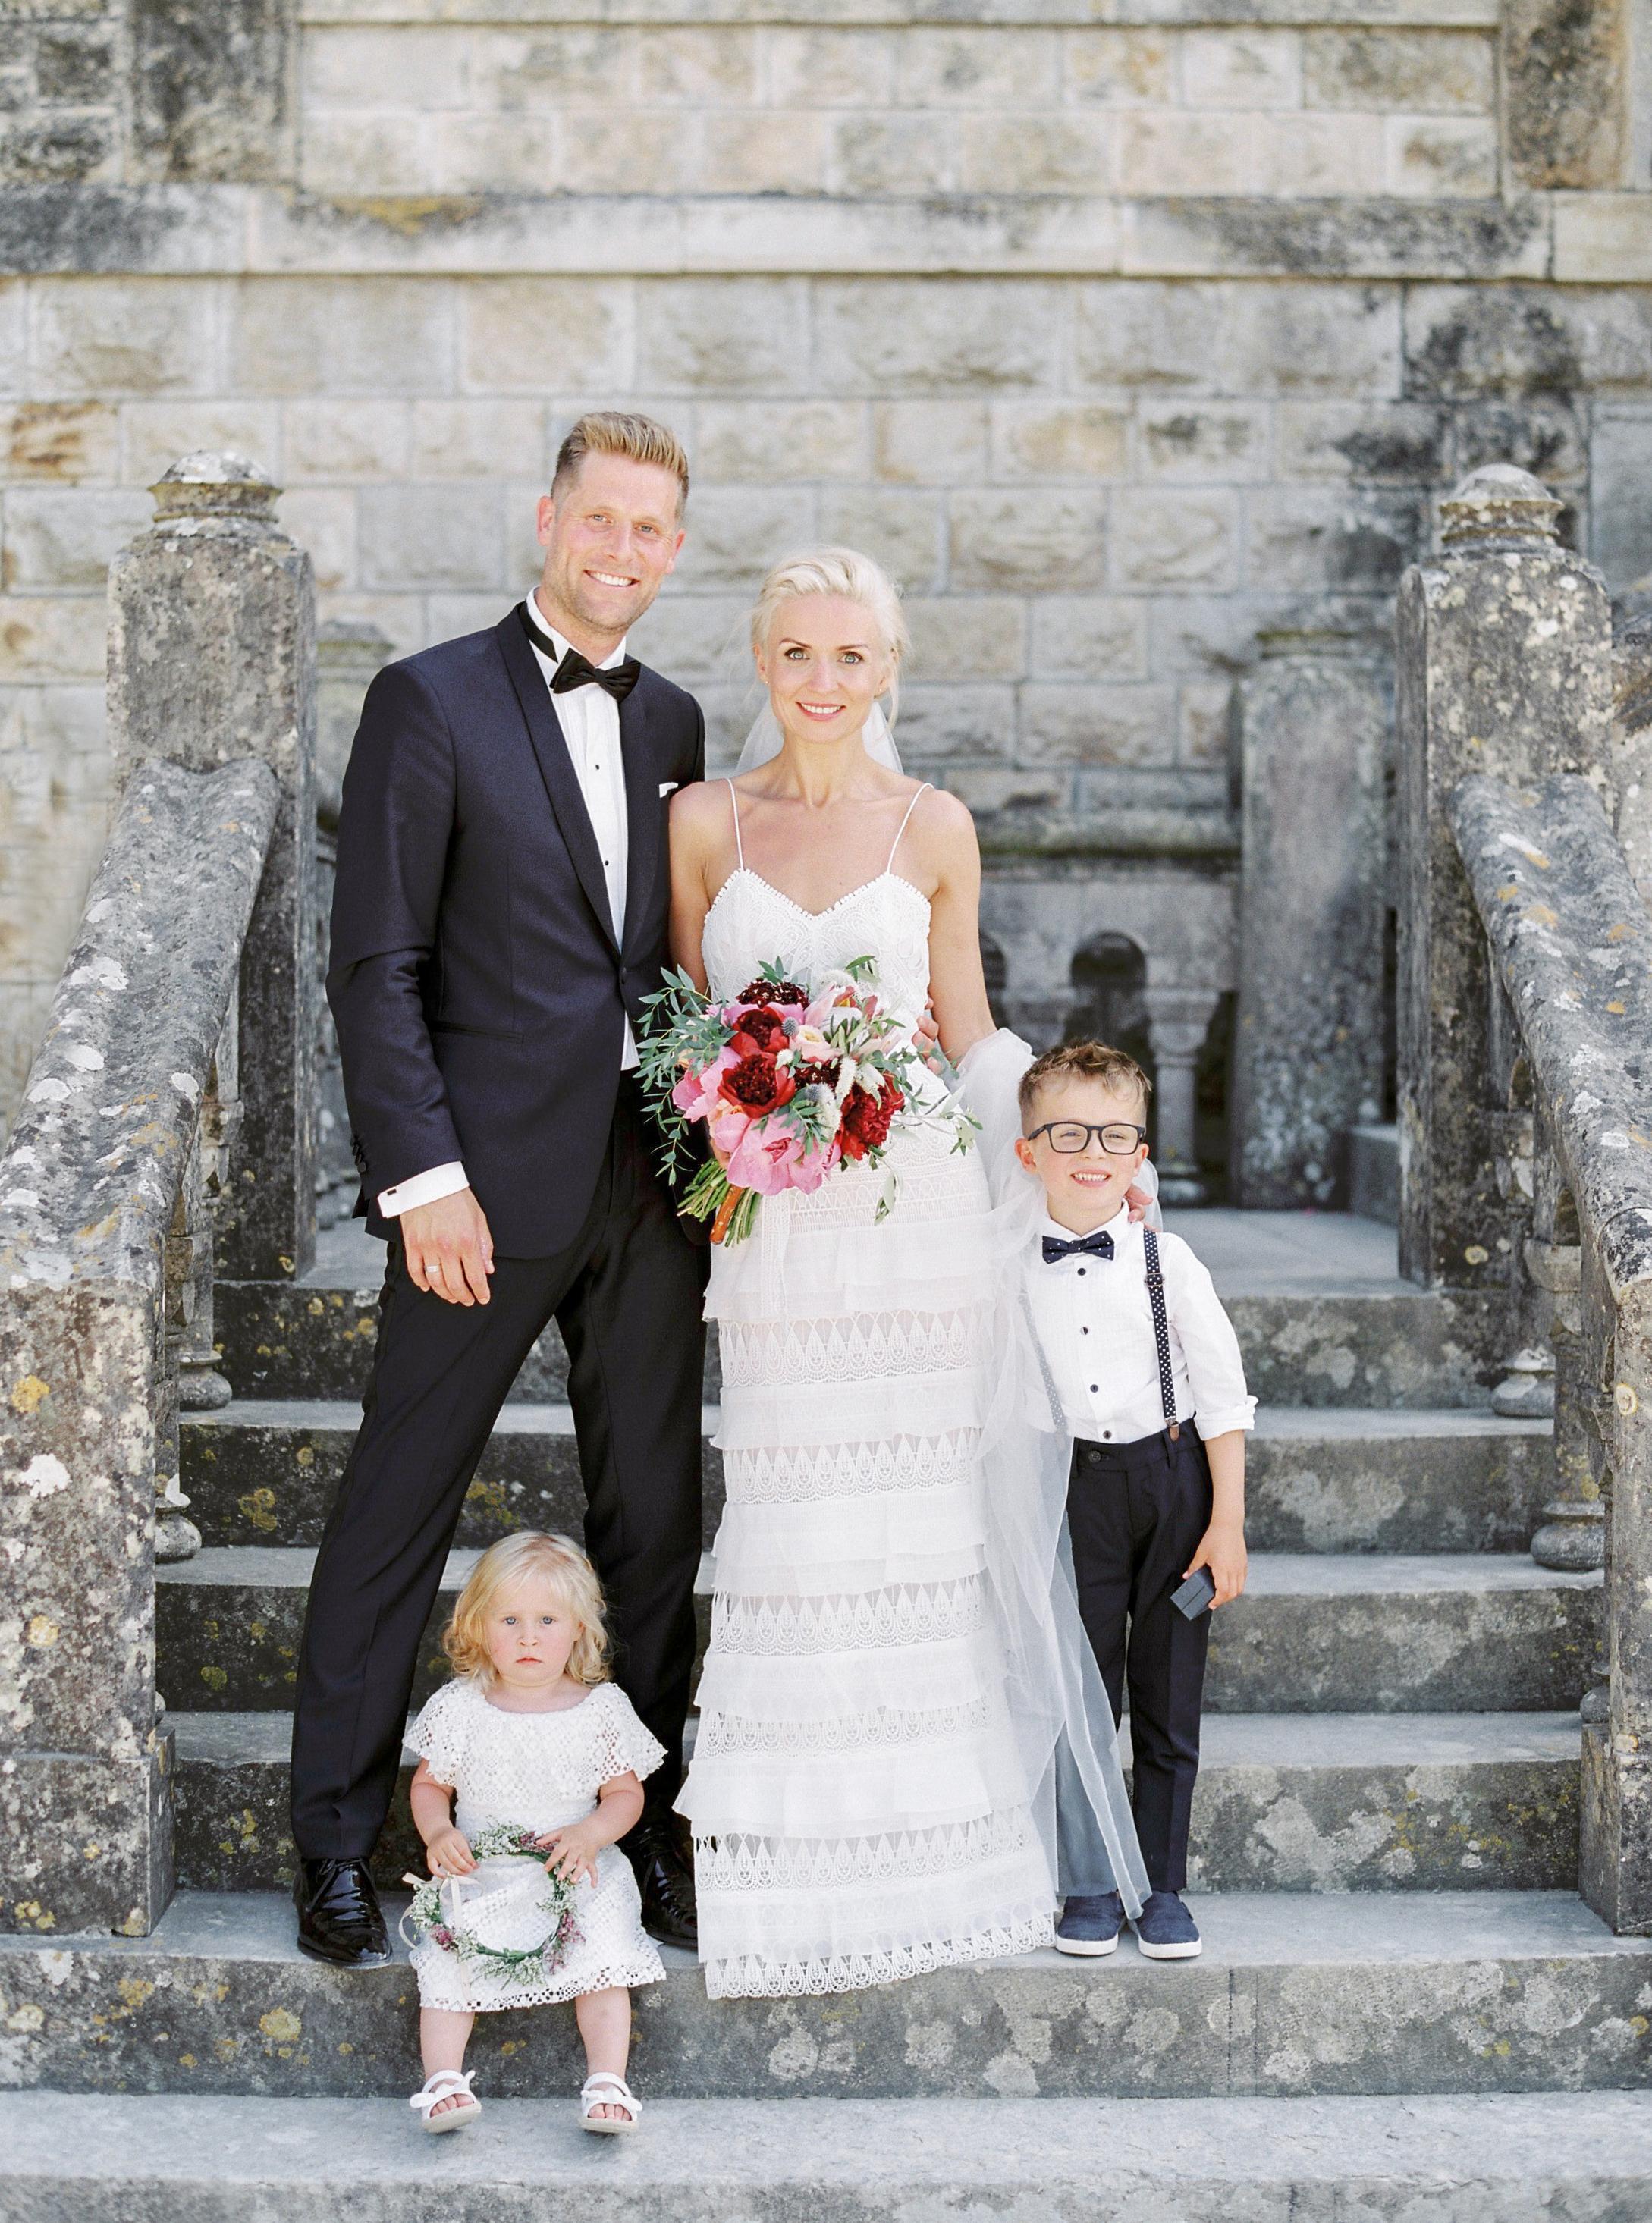 Nastia_Vesna_Photography_Wedding_Portugal_42.jpg